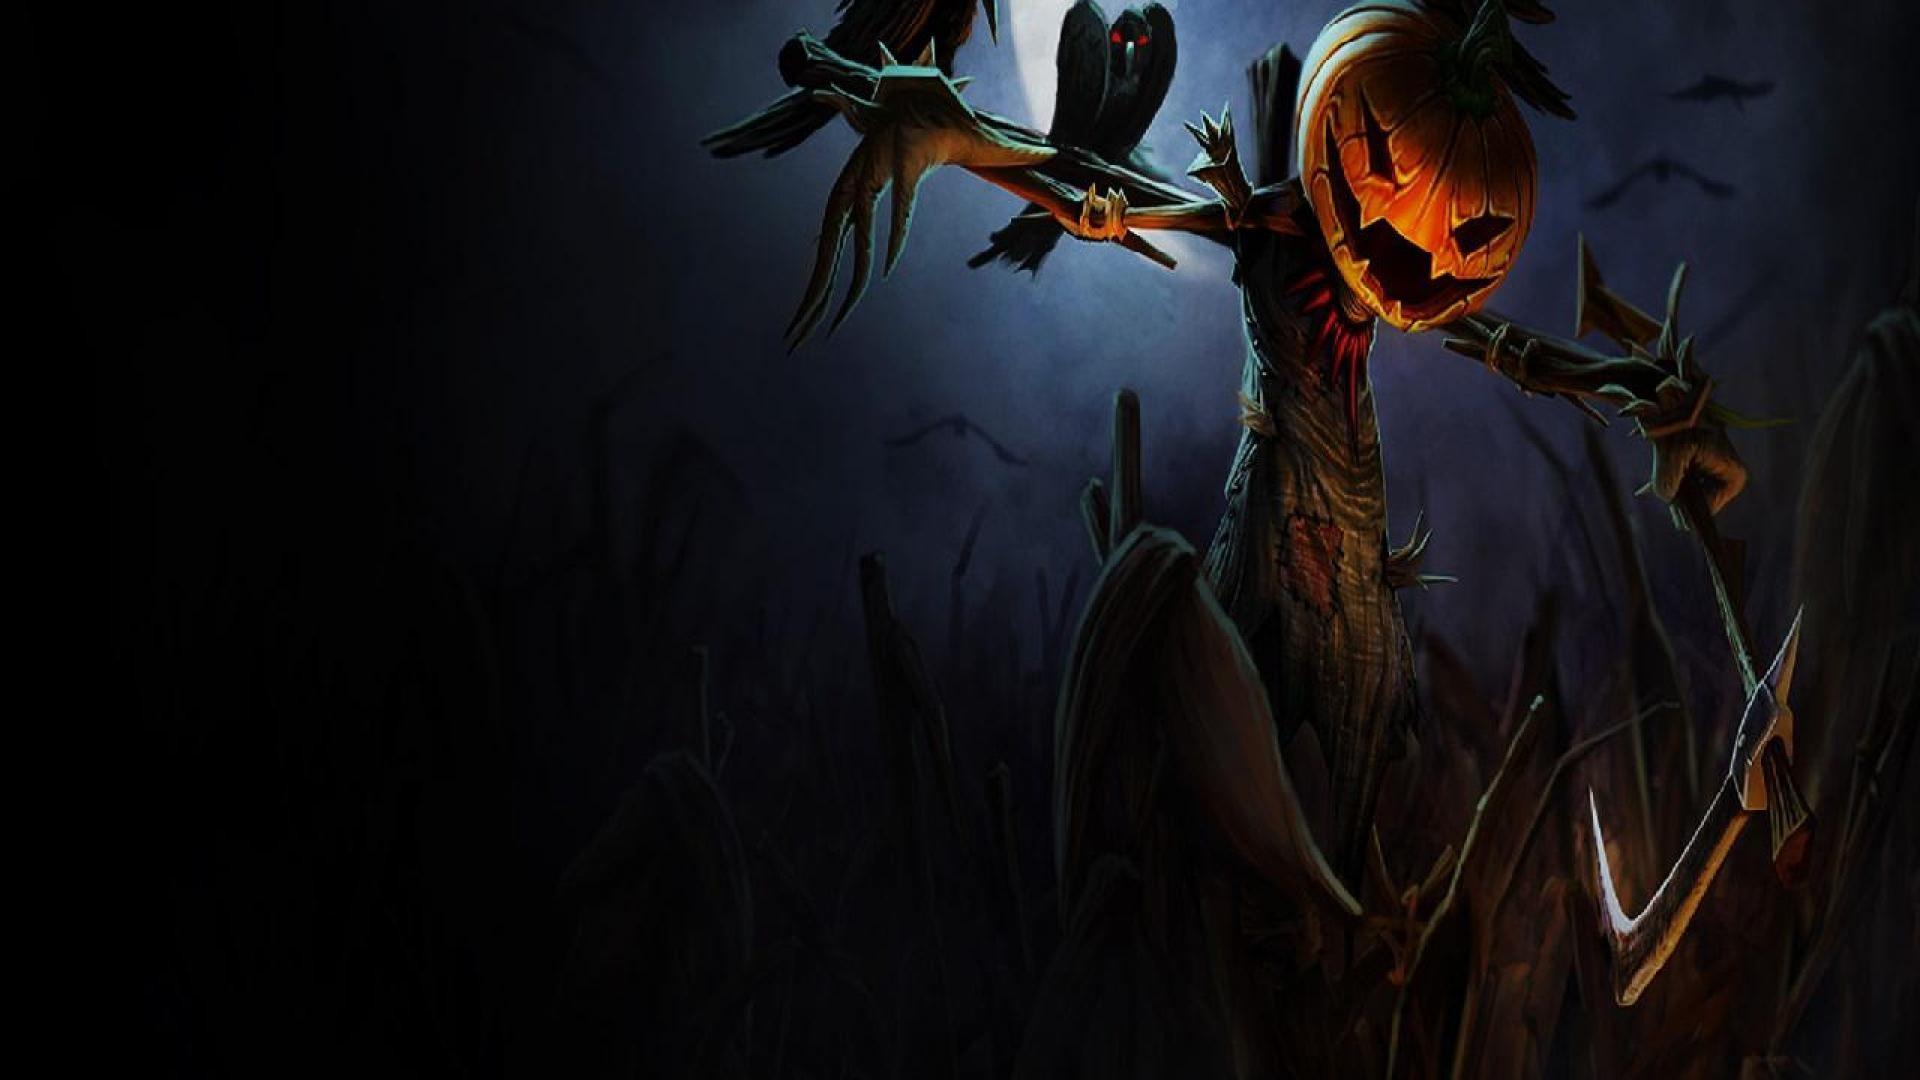 Fall Hd Wallpapers 1080p Widescreen Scarecrow Wallpaper 183 ①